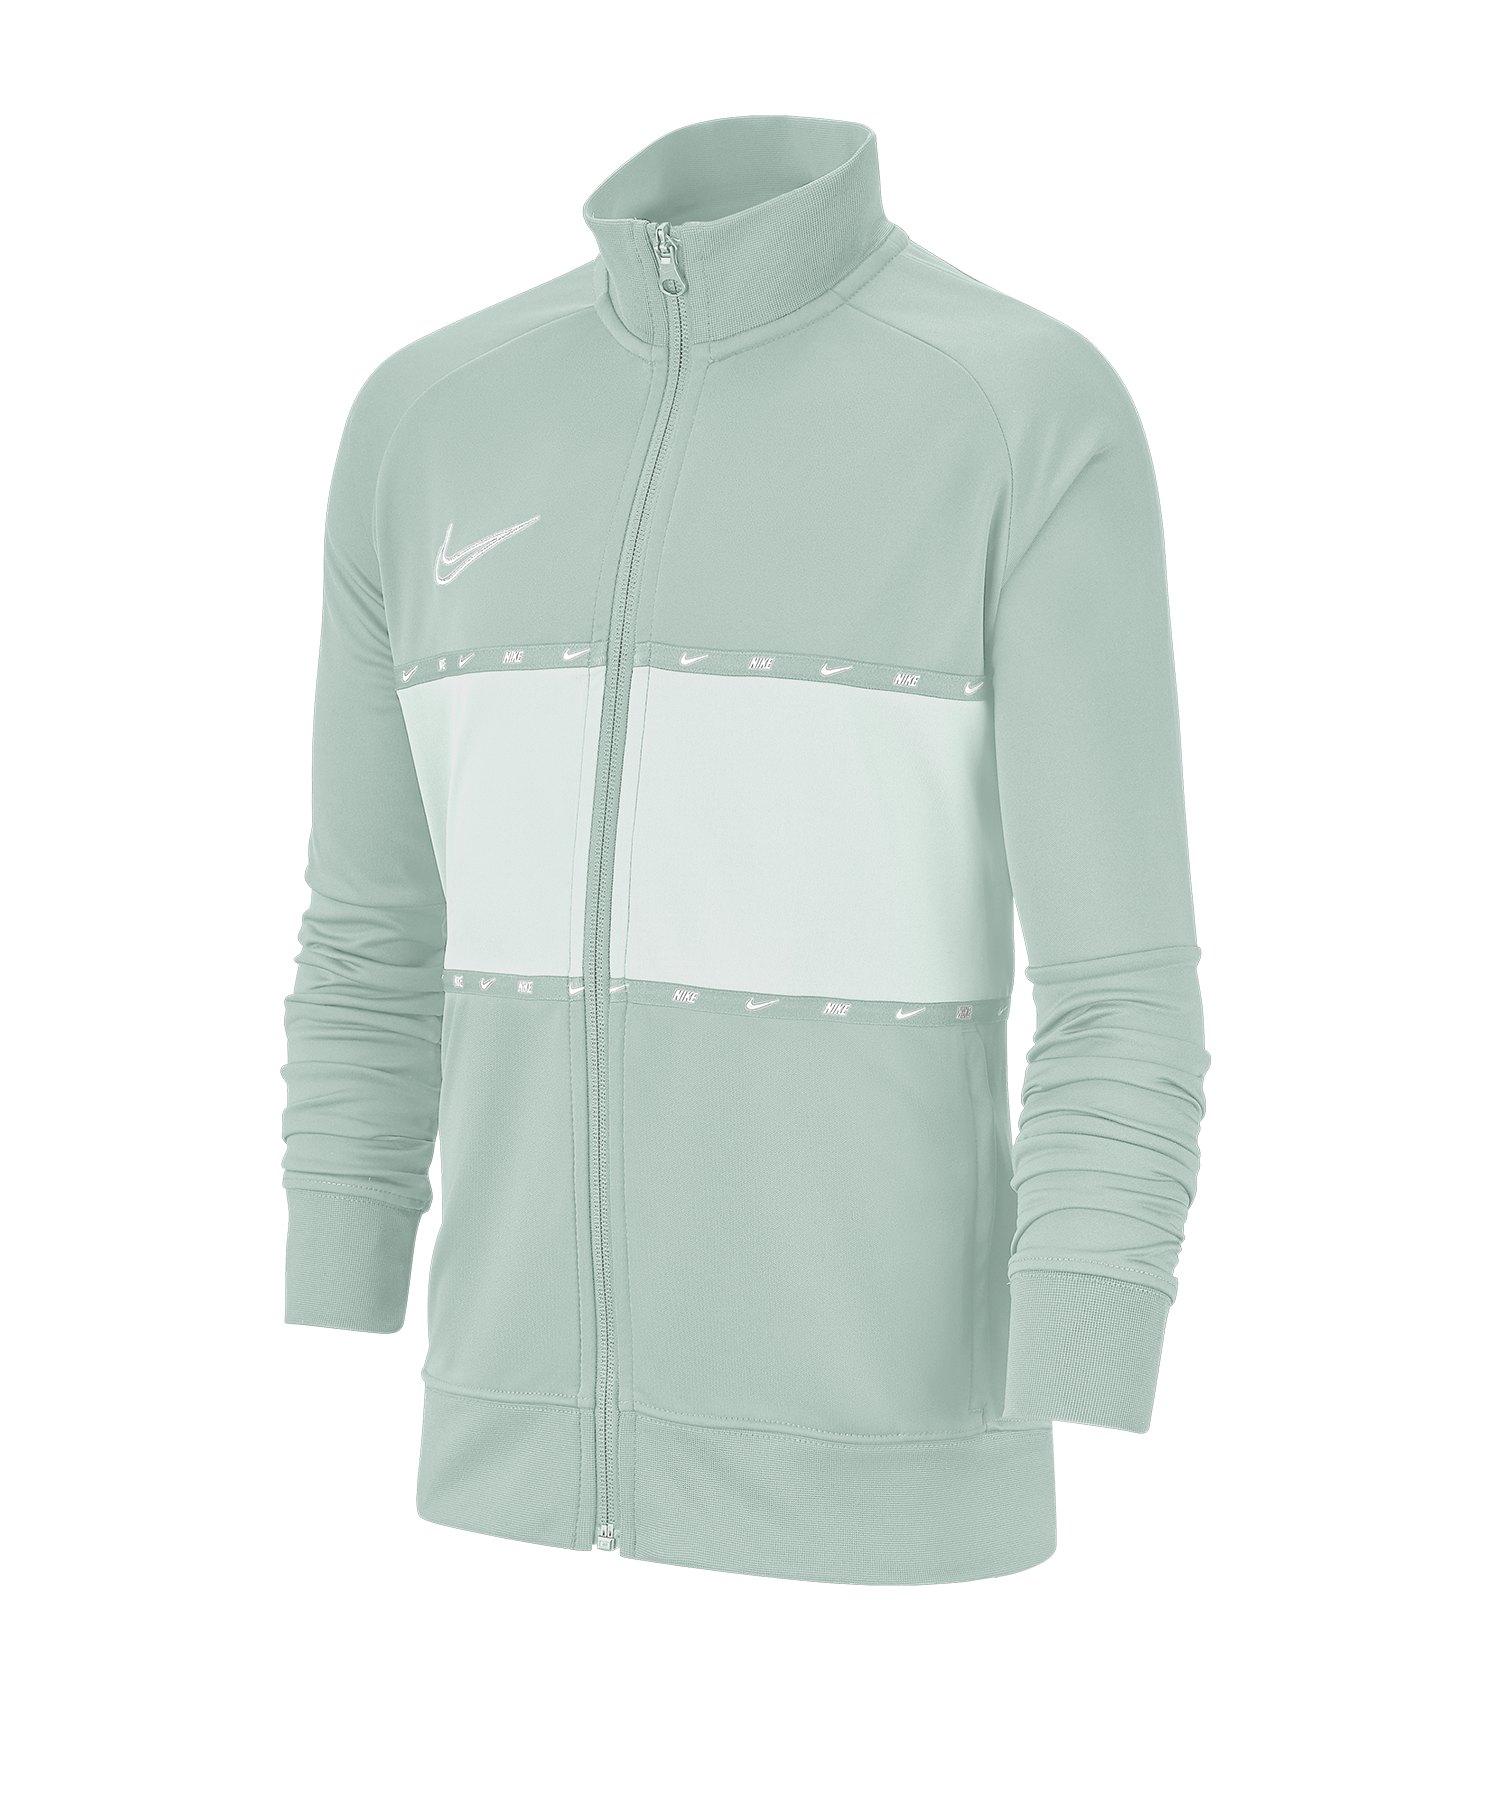 Nike Academy Dri-FIT Trainingsjacke Kids Grün F321 - gruen